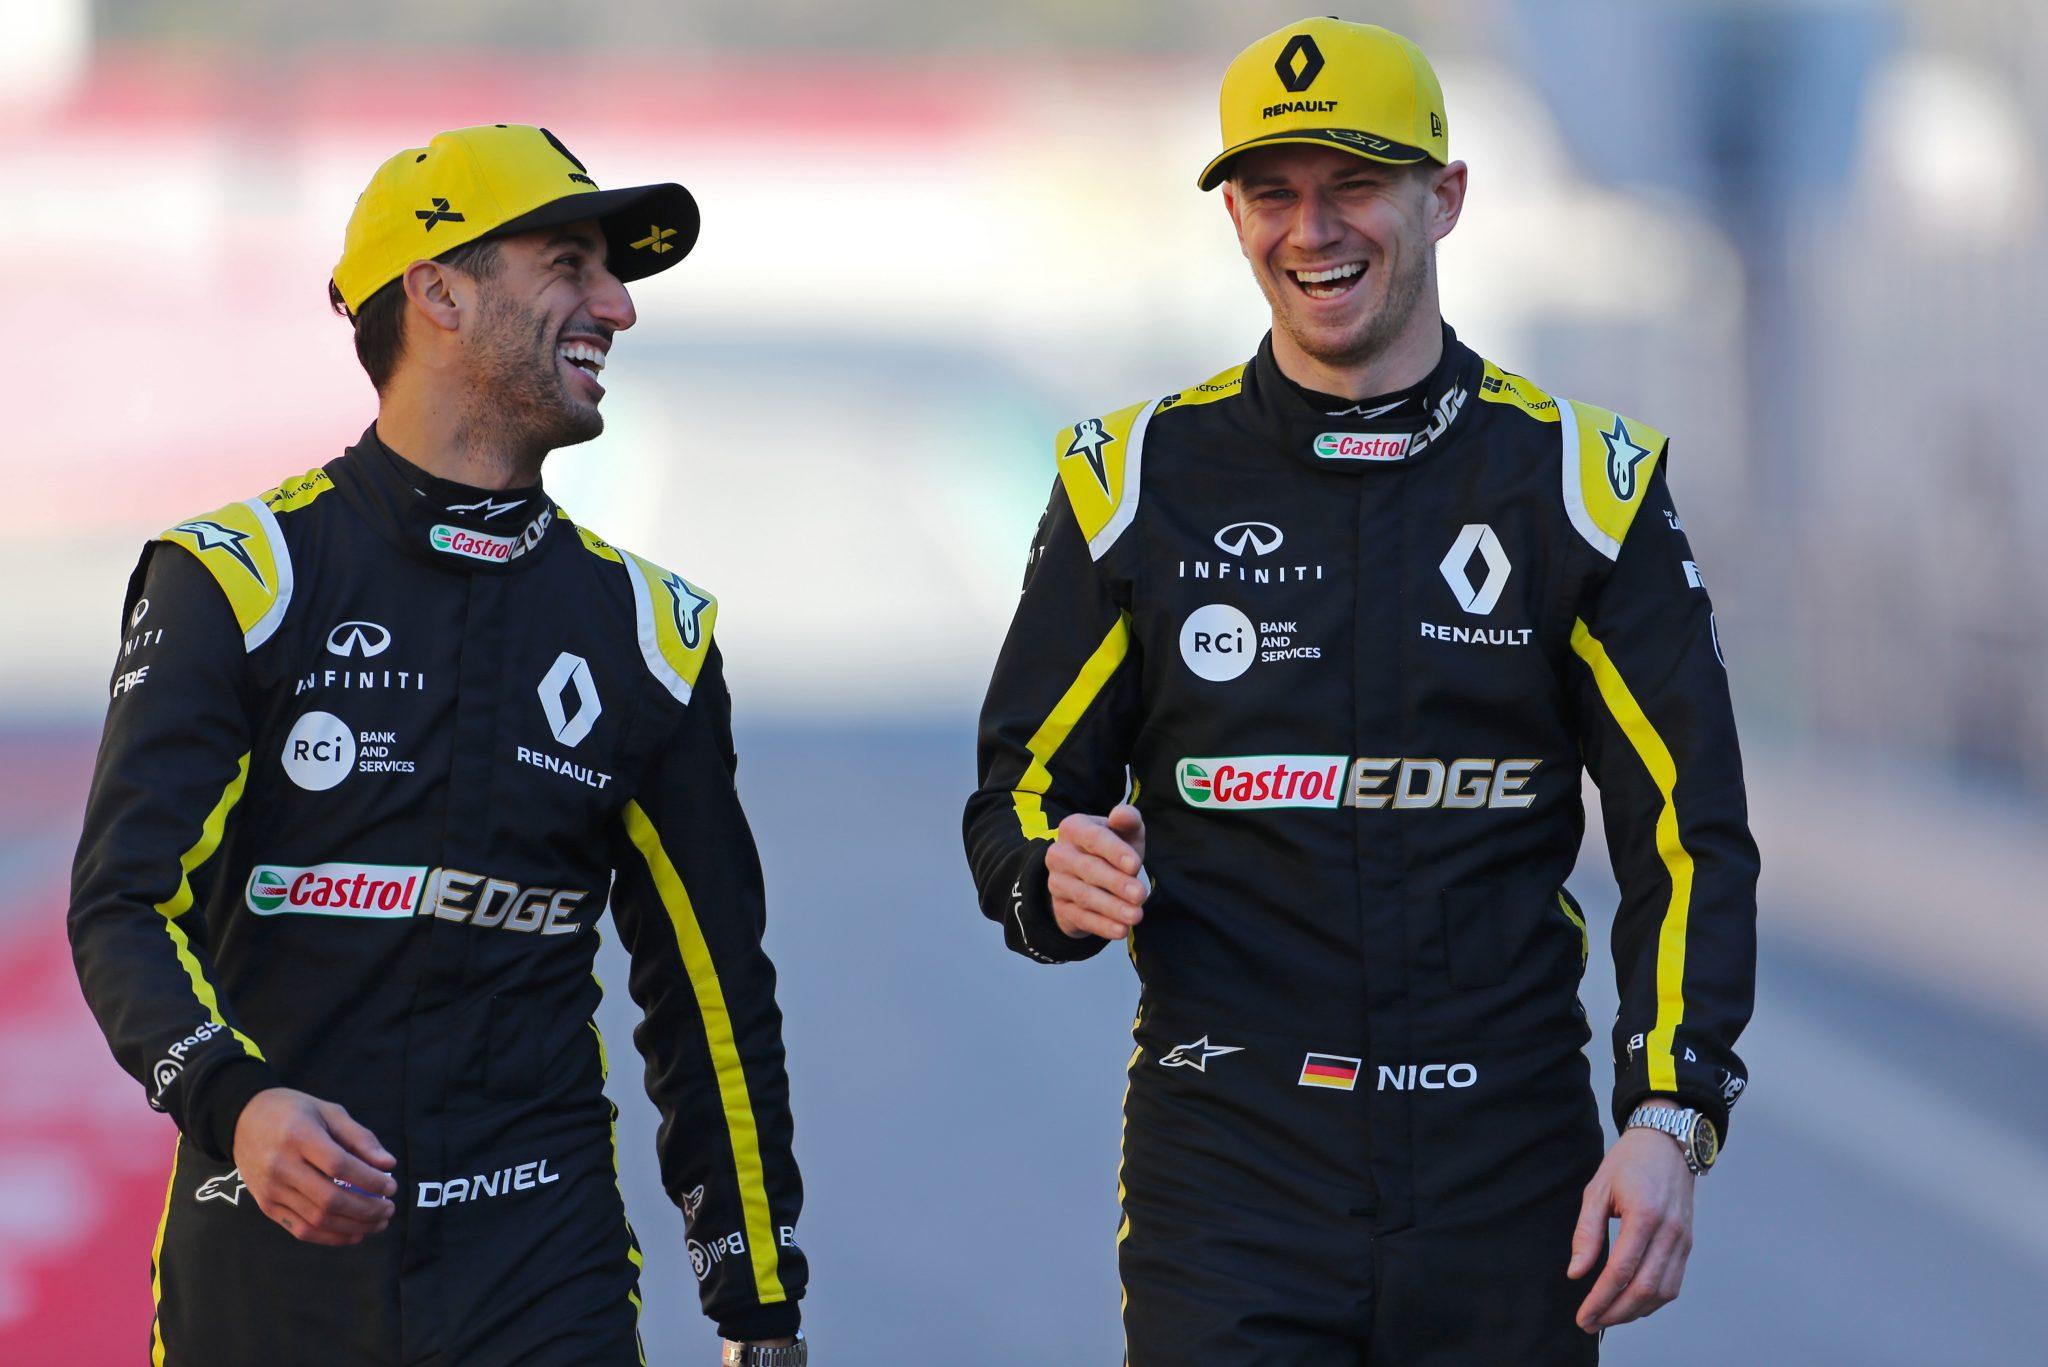 (L to R): Daniel Ricciardo (AUS) Renault Sport F1 Team with Nico Hulkenberg (GER) Renault Sport F1 Team.